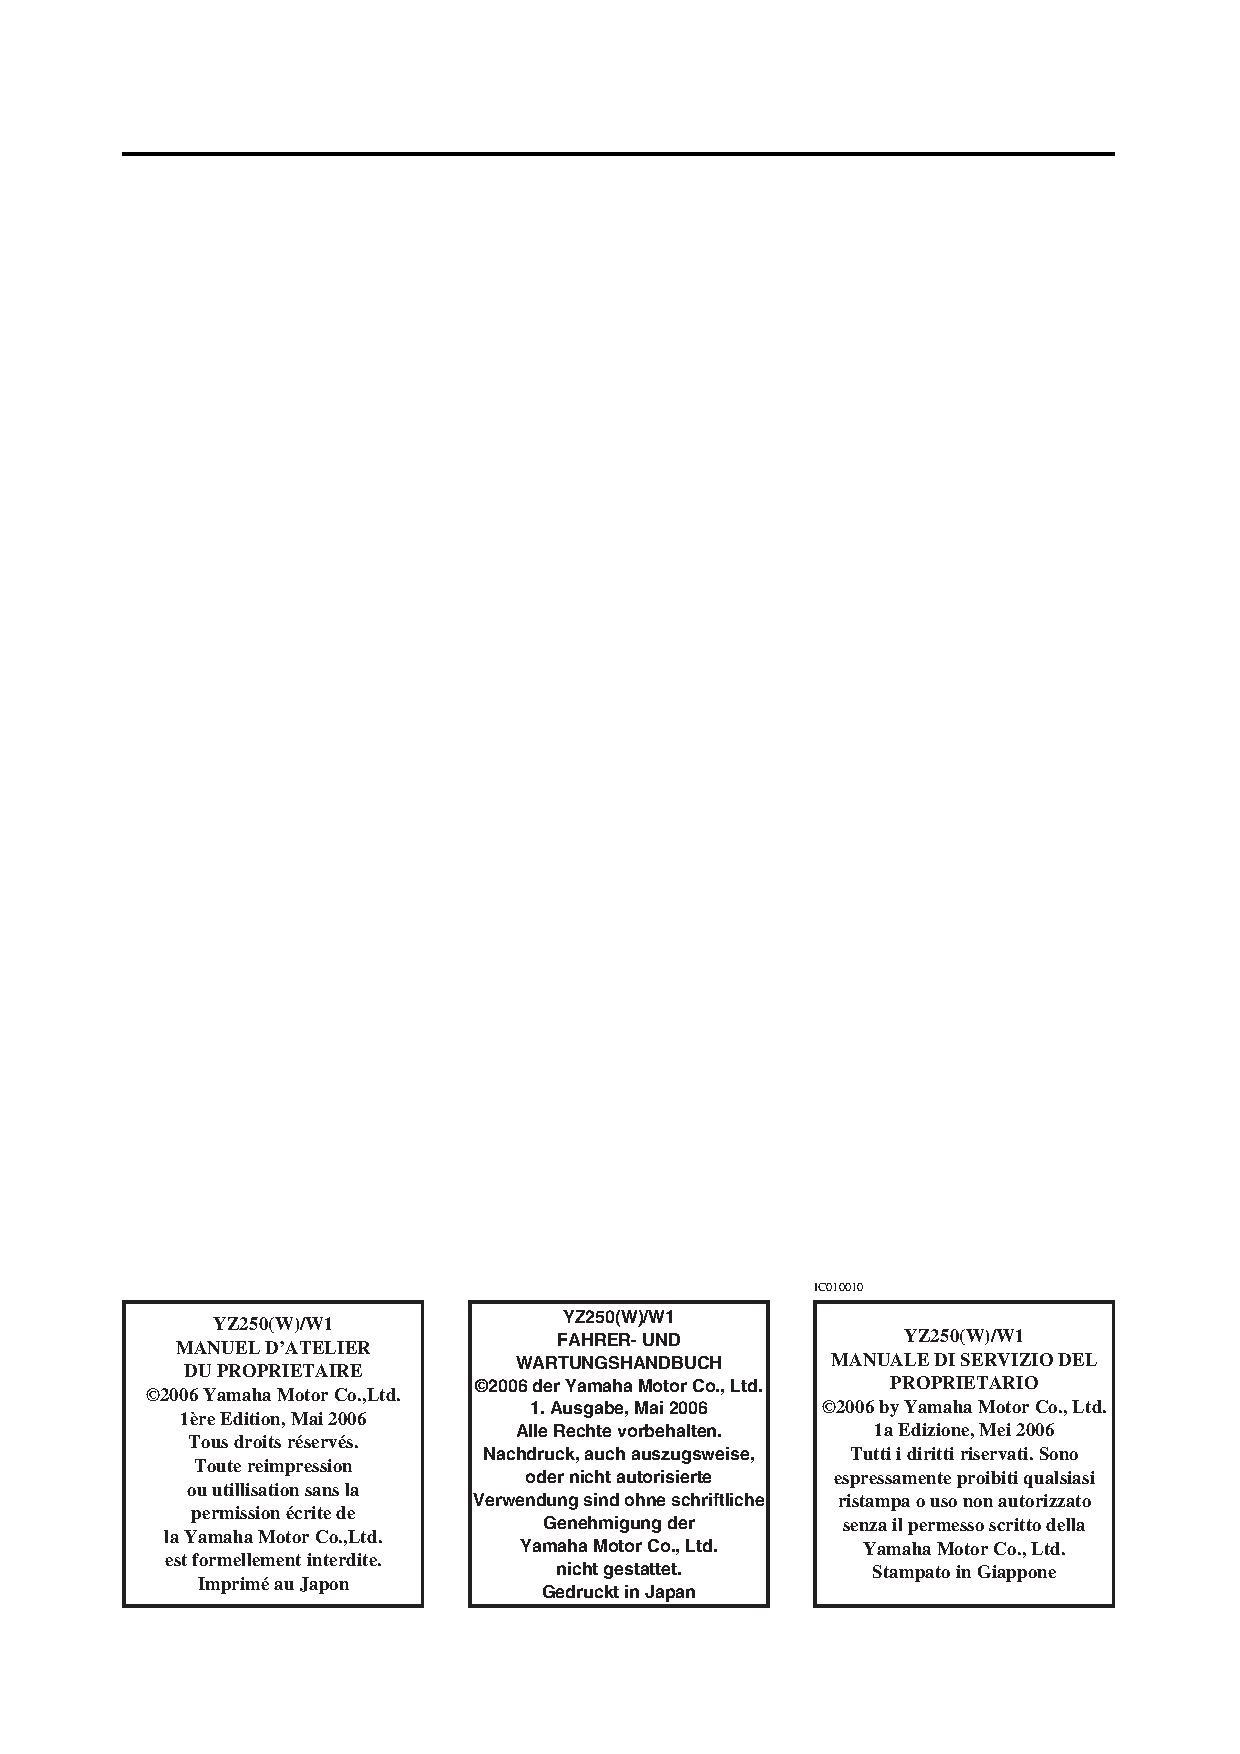 File:2007 Yamaha YZ250 W Owners Service Manual.pdf